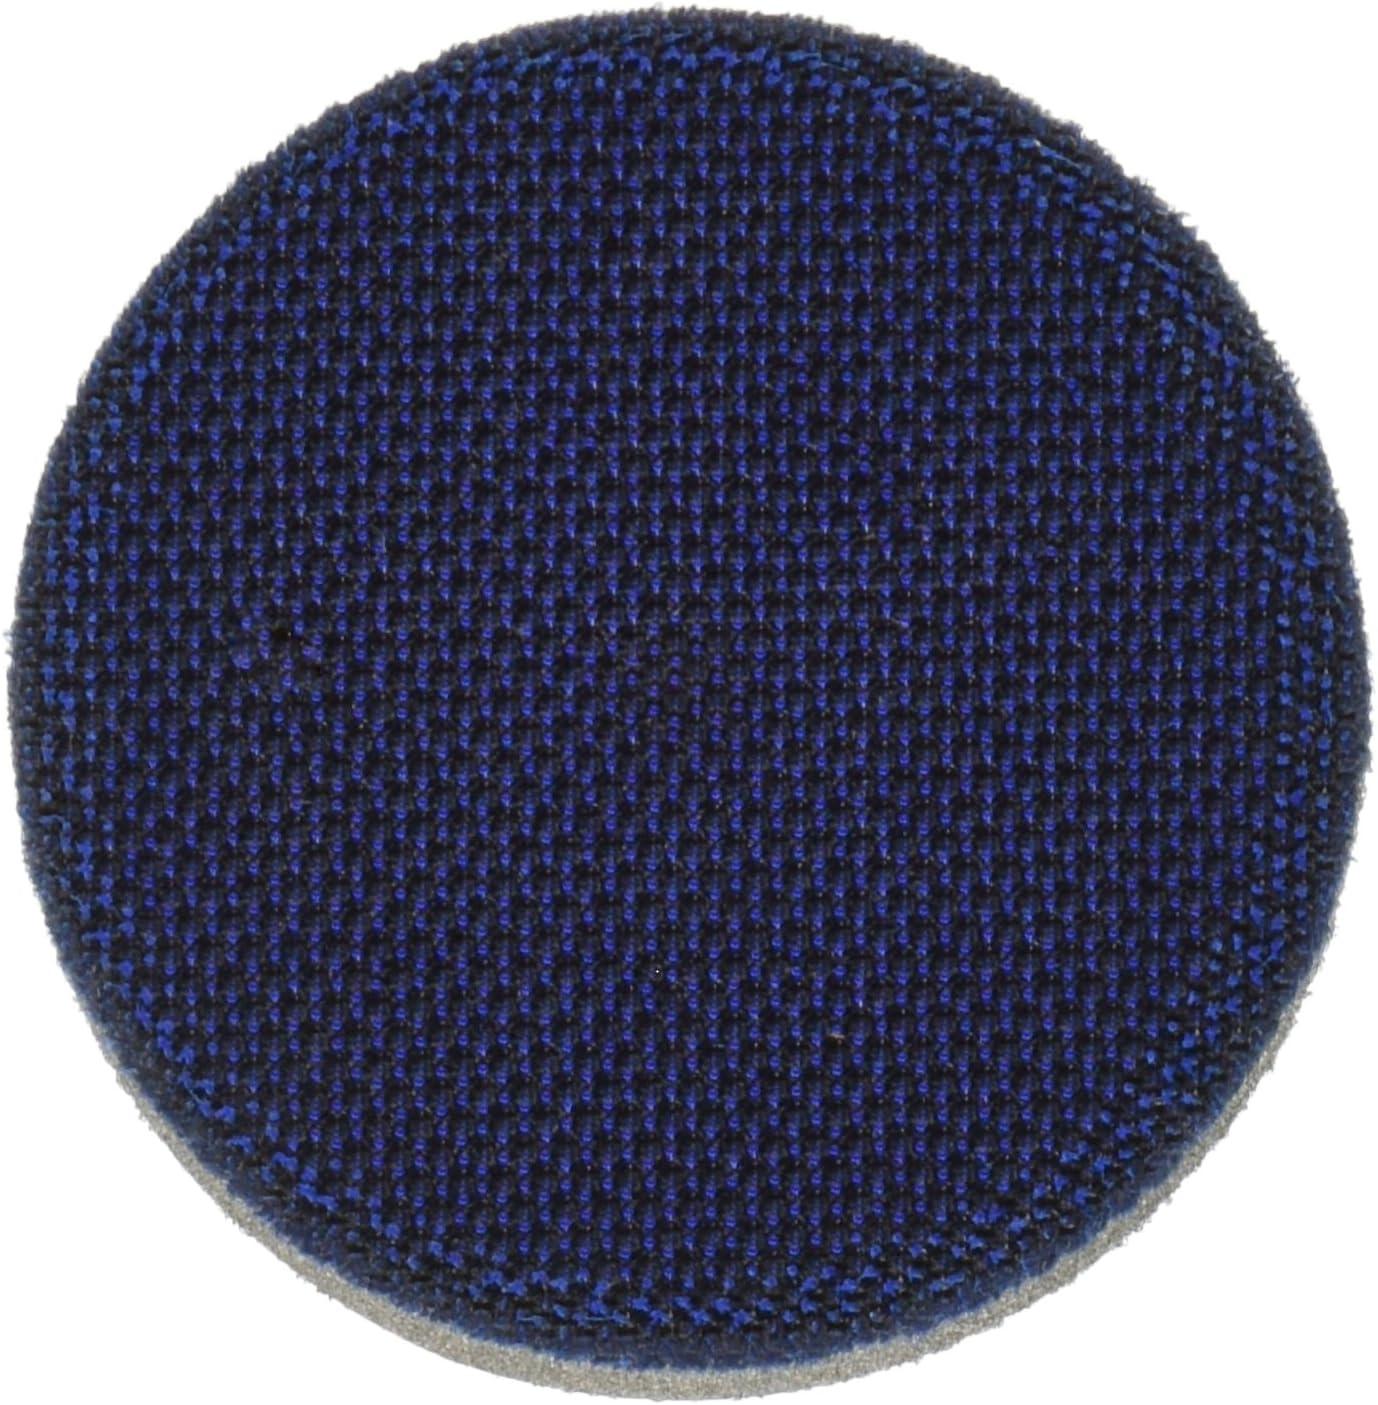 Dynabrade 50120 3-Inch Diameter Disc Pad